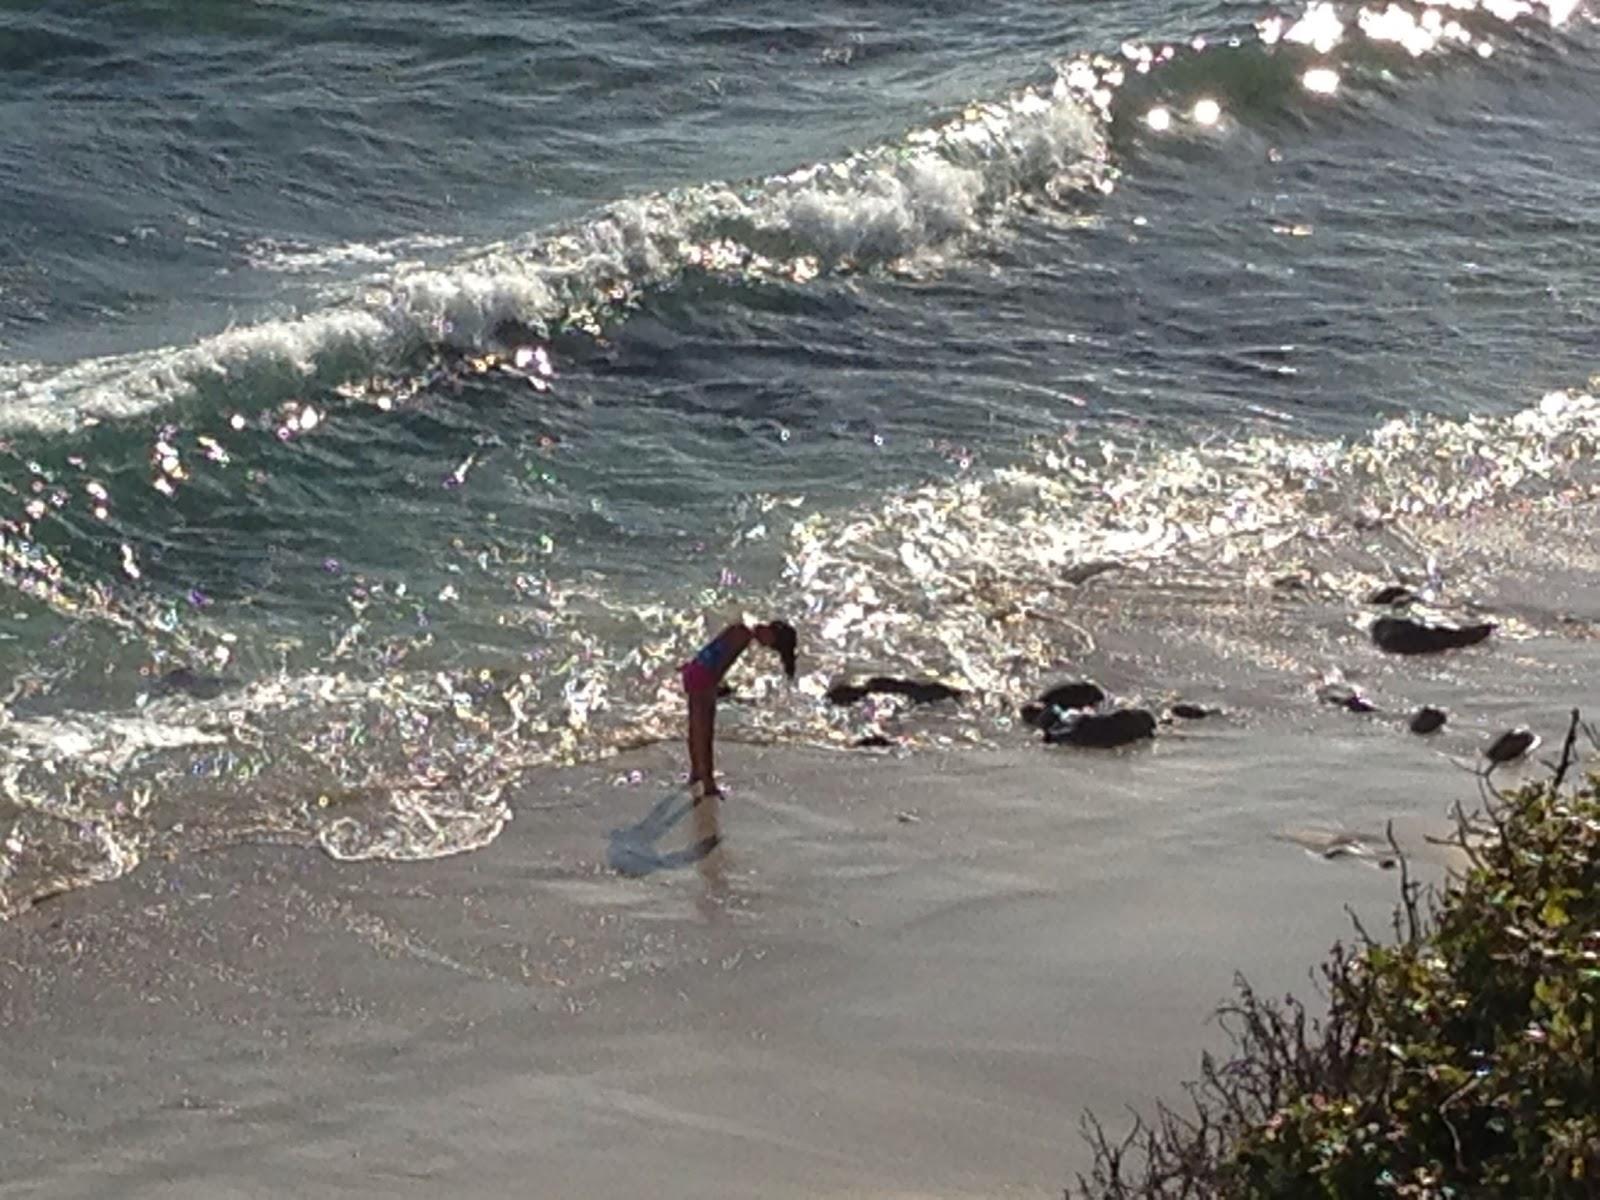 Pacific Ocean, very private durg rehab